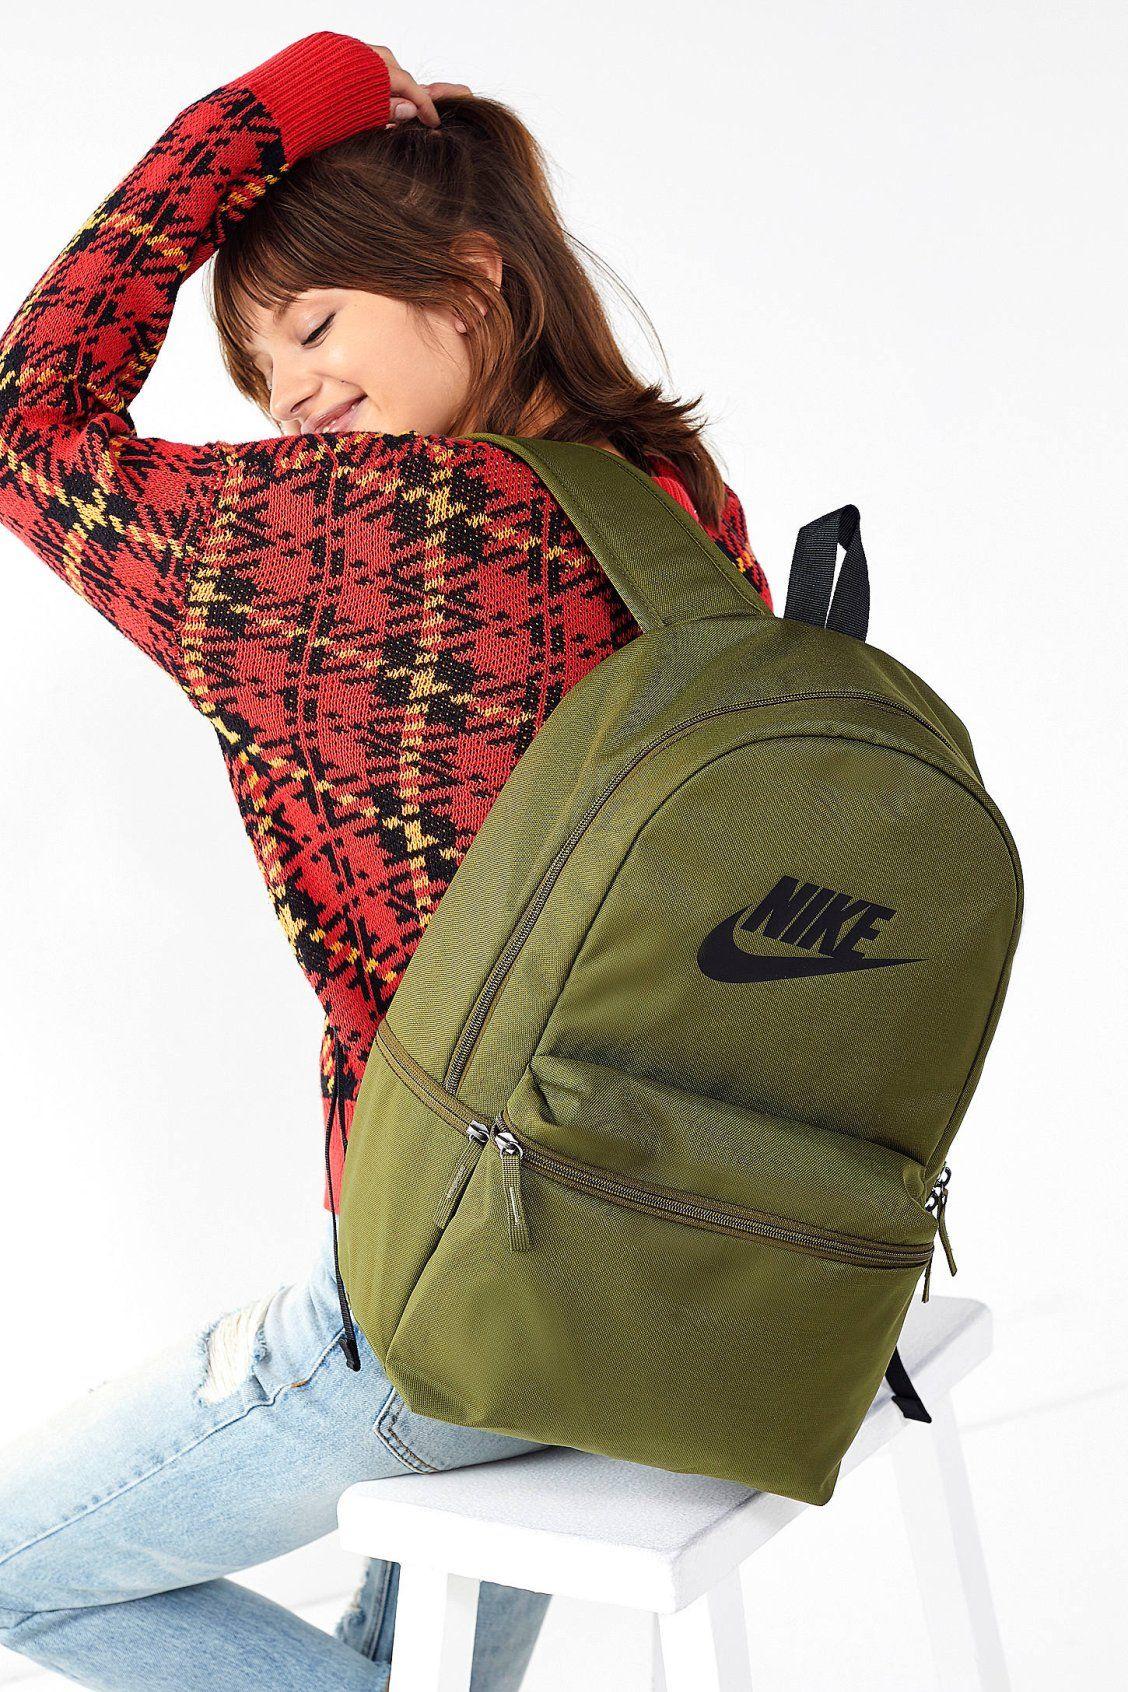 8f47cfb3060 Nike Sportswear Heritage Backpack   Accessorize   Pinterest   Nike ...